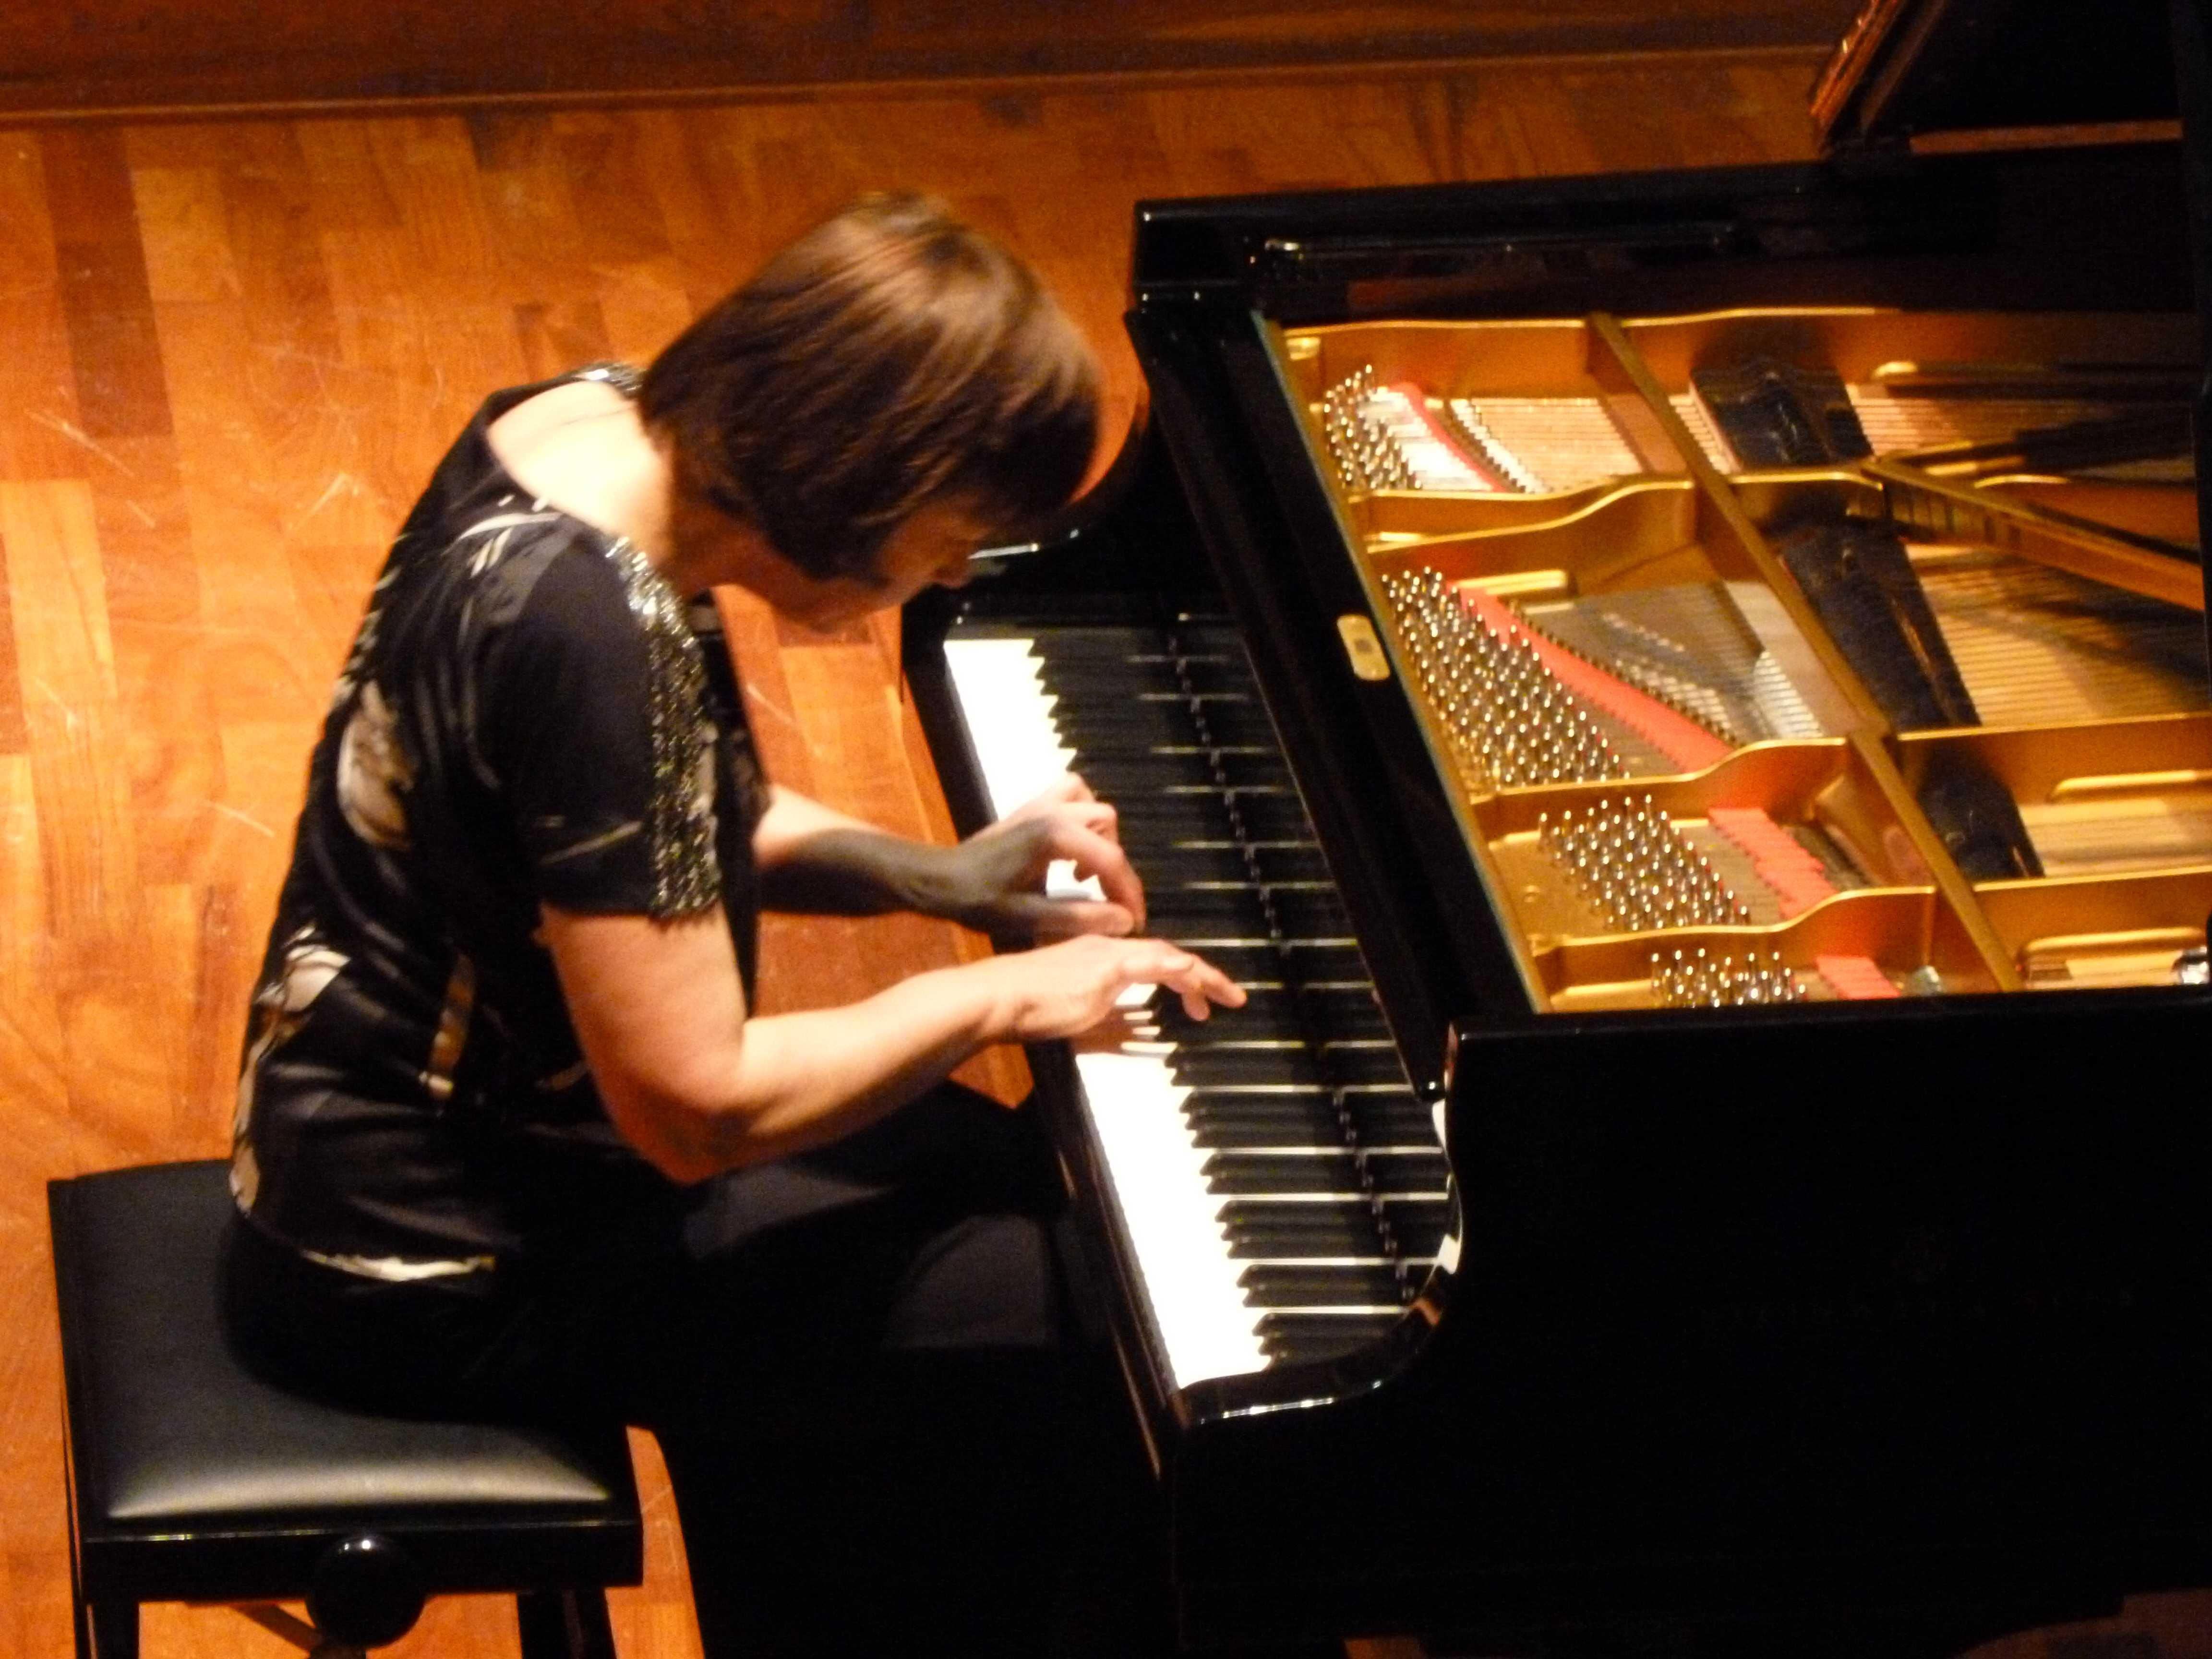 La pianista Joanna Trzciak in concerto. Sassari, sala Sassu 15 maggio 2012